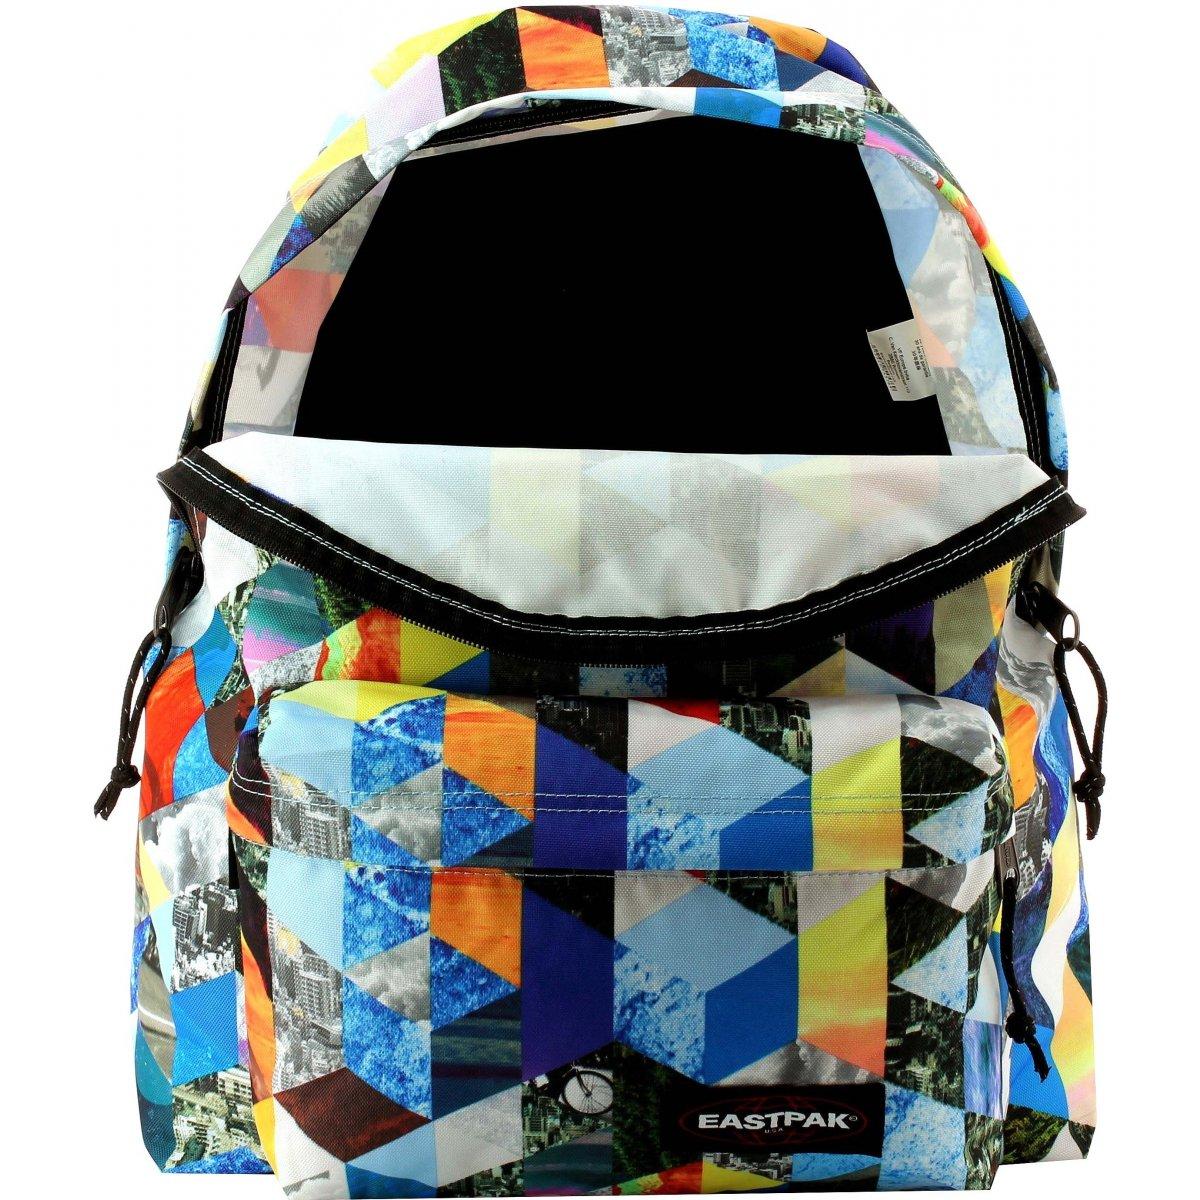 sac dos scolaire eastpak ek620 ek62065m couleur principale assortis. Black Bedroom Furniture Sets. Home Design Ideas